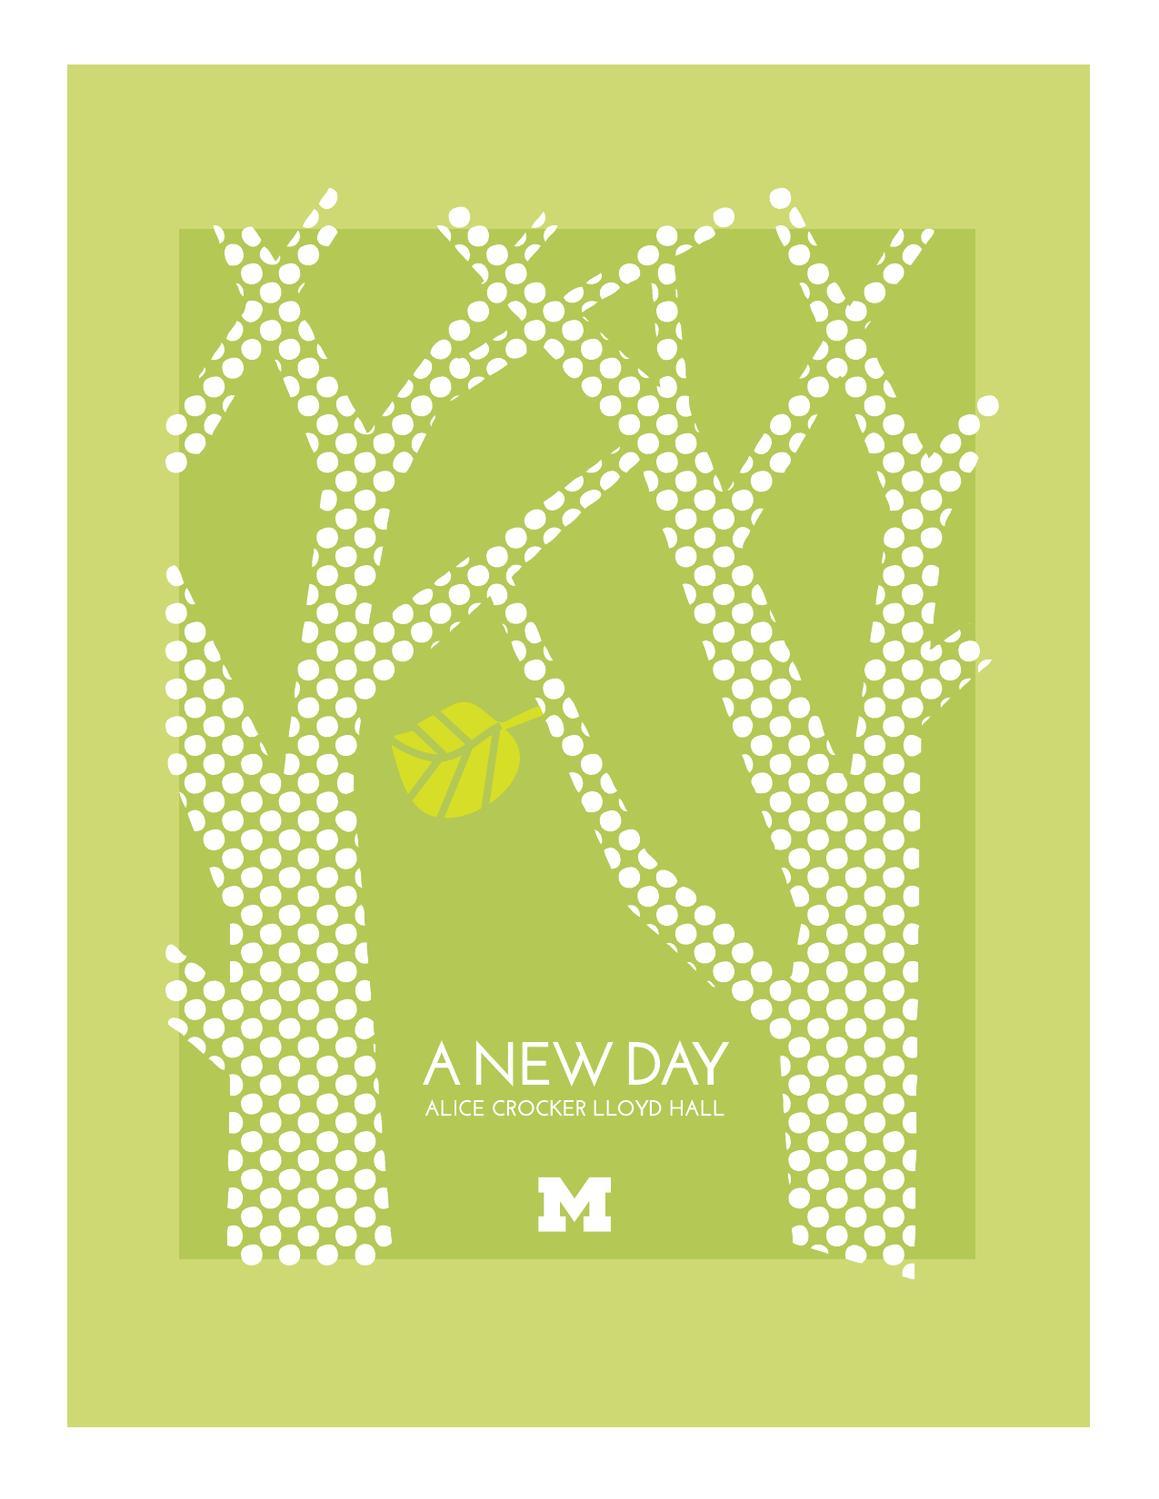 Alice Crocker Lloyd Hall Tour Brochure By University Of Michigan Housing Issuu